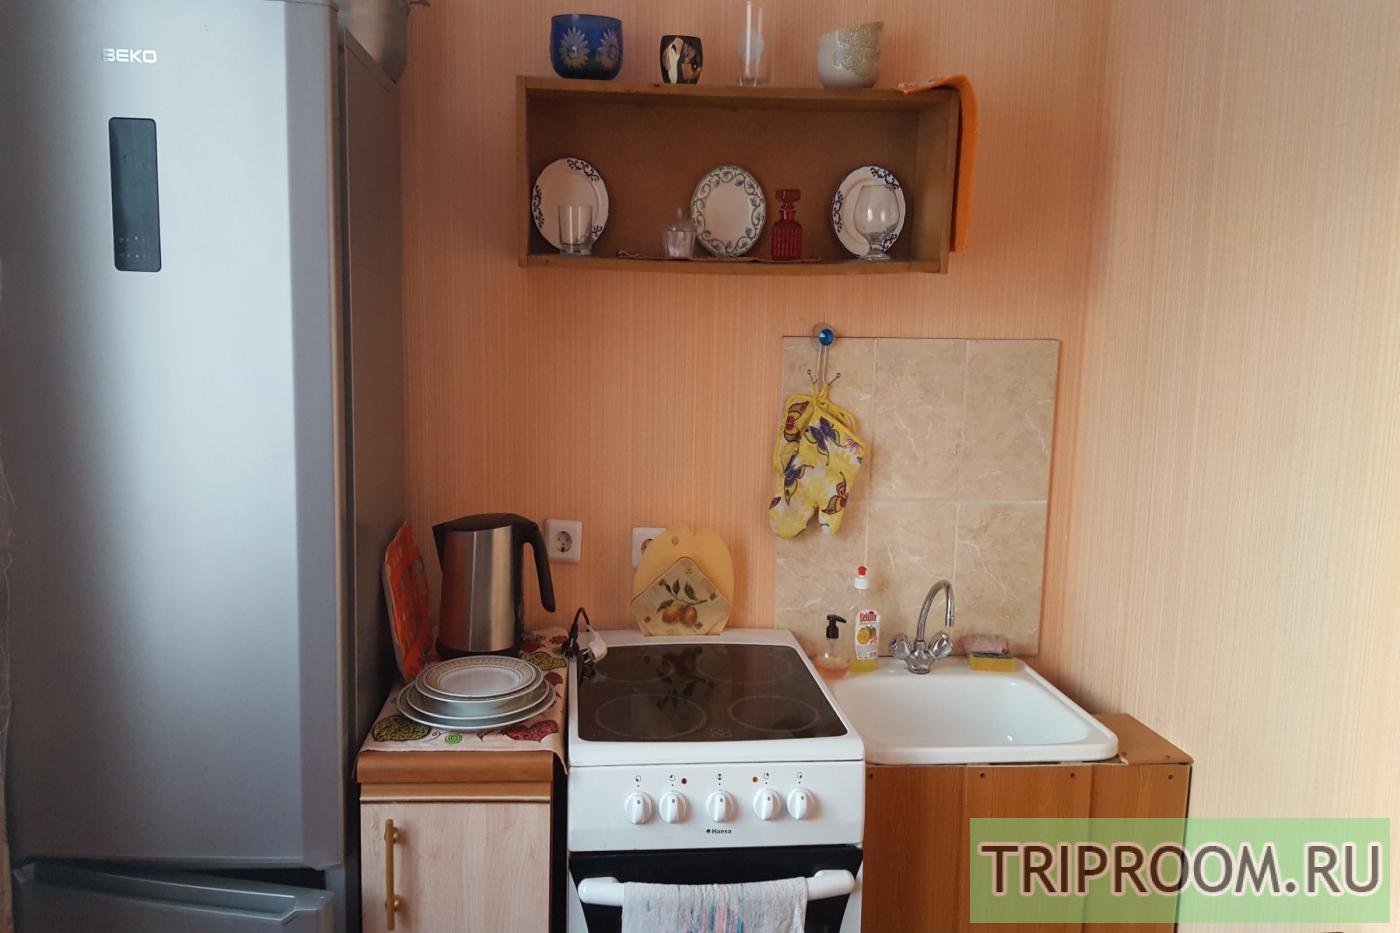 1-комнатная квартира посуточно (вариант № 30847), ул. Строителей улица, фото № 20